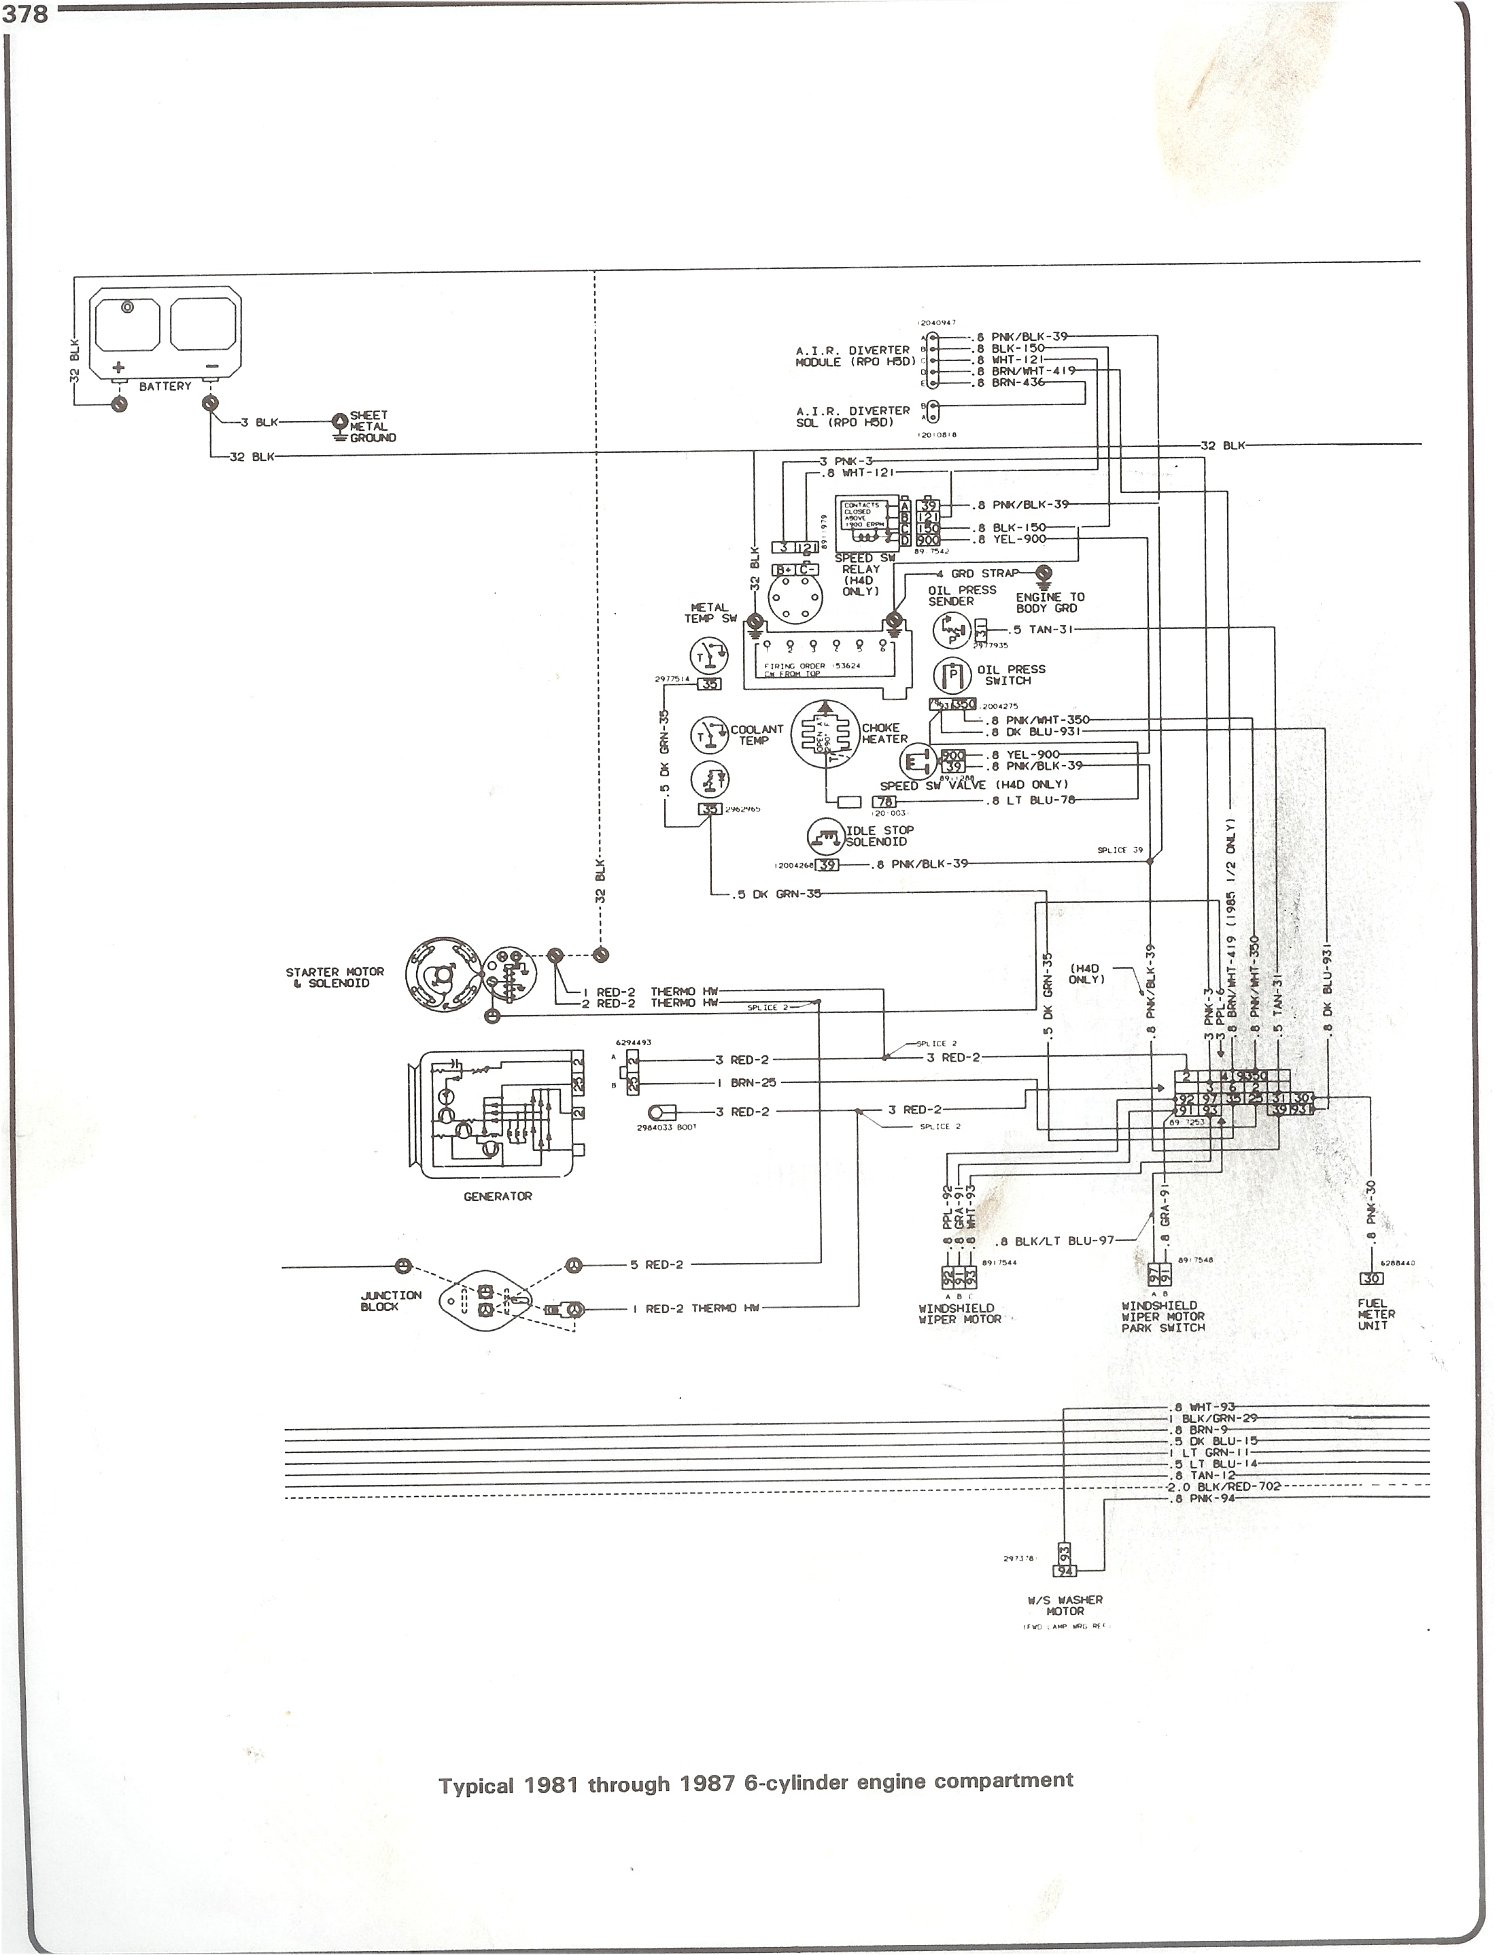 Phenomenal 1976 Chevy Wiring Basic Electronics Wiring Diagram Wiring Cloud Hemtshollocom